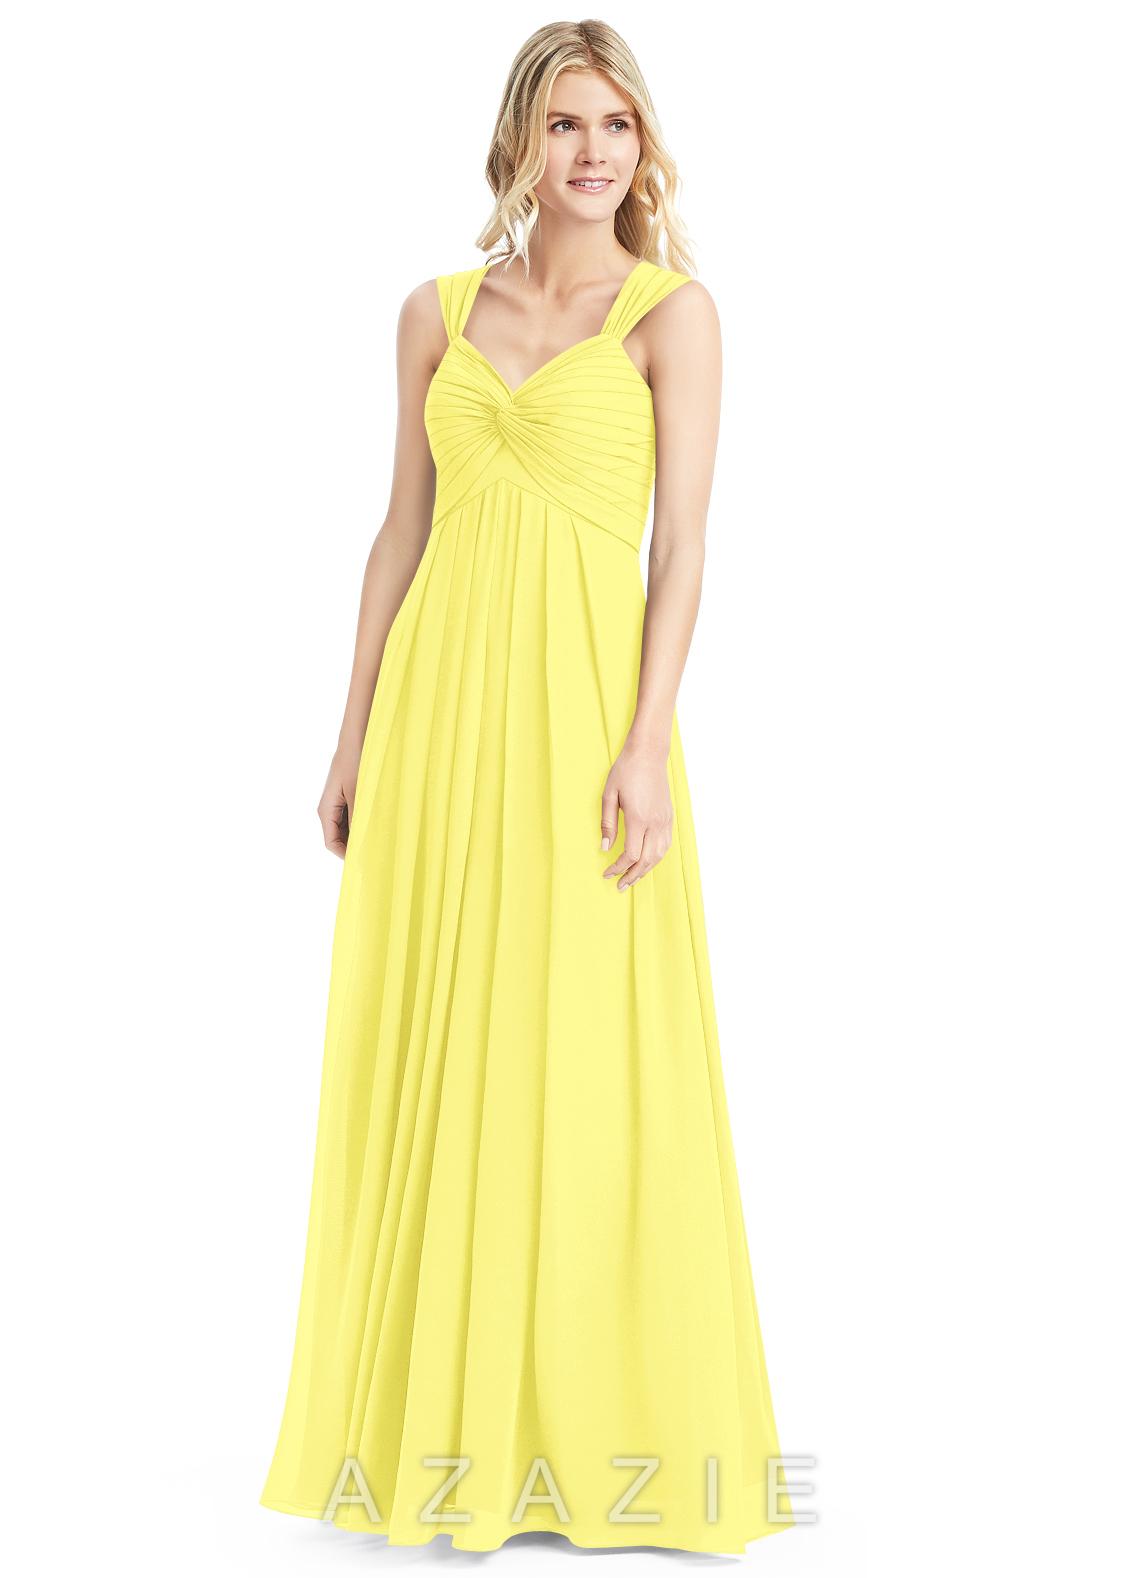 Azazie kaitlynn bridesmaid dress azazie color lemon ombrellifo Images